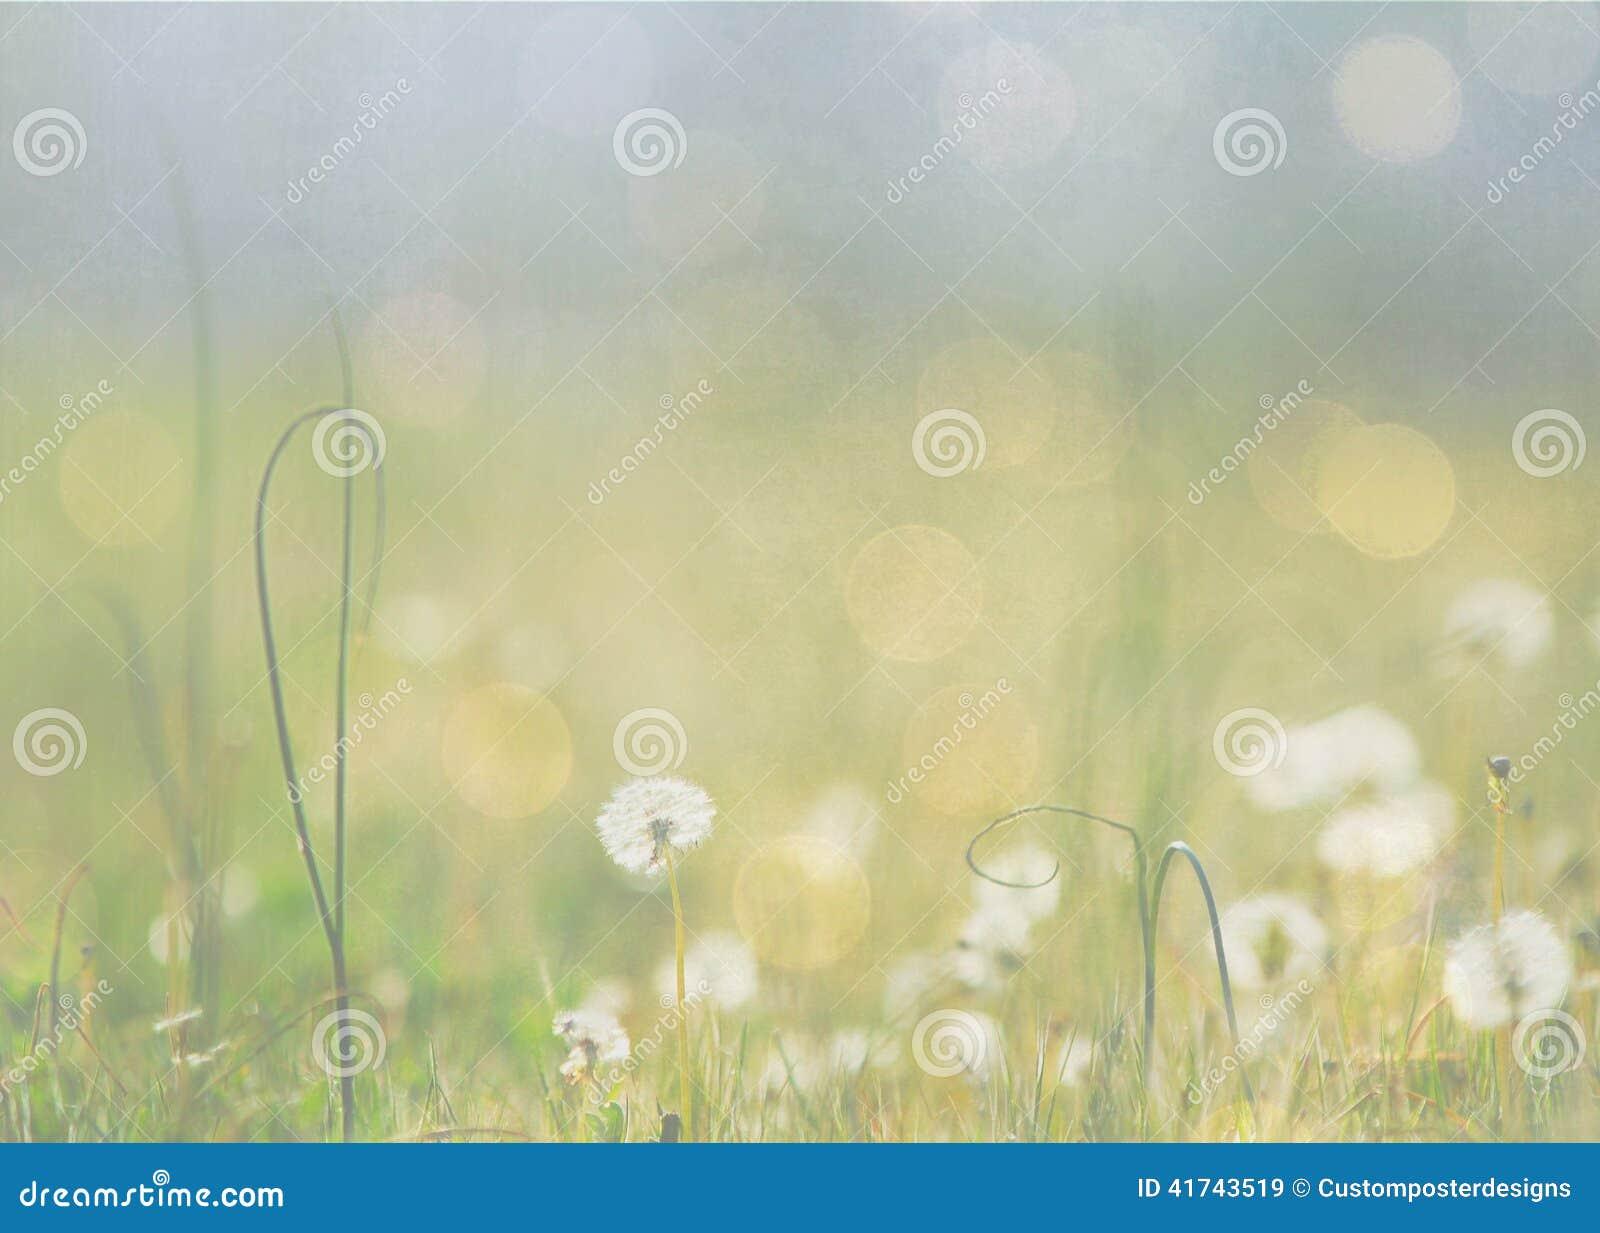 Download A meadow of dandelions. stock image. Image of focus, design - 41743519